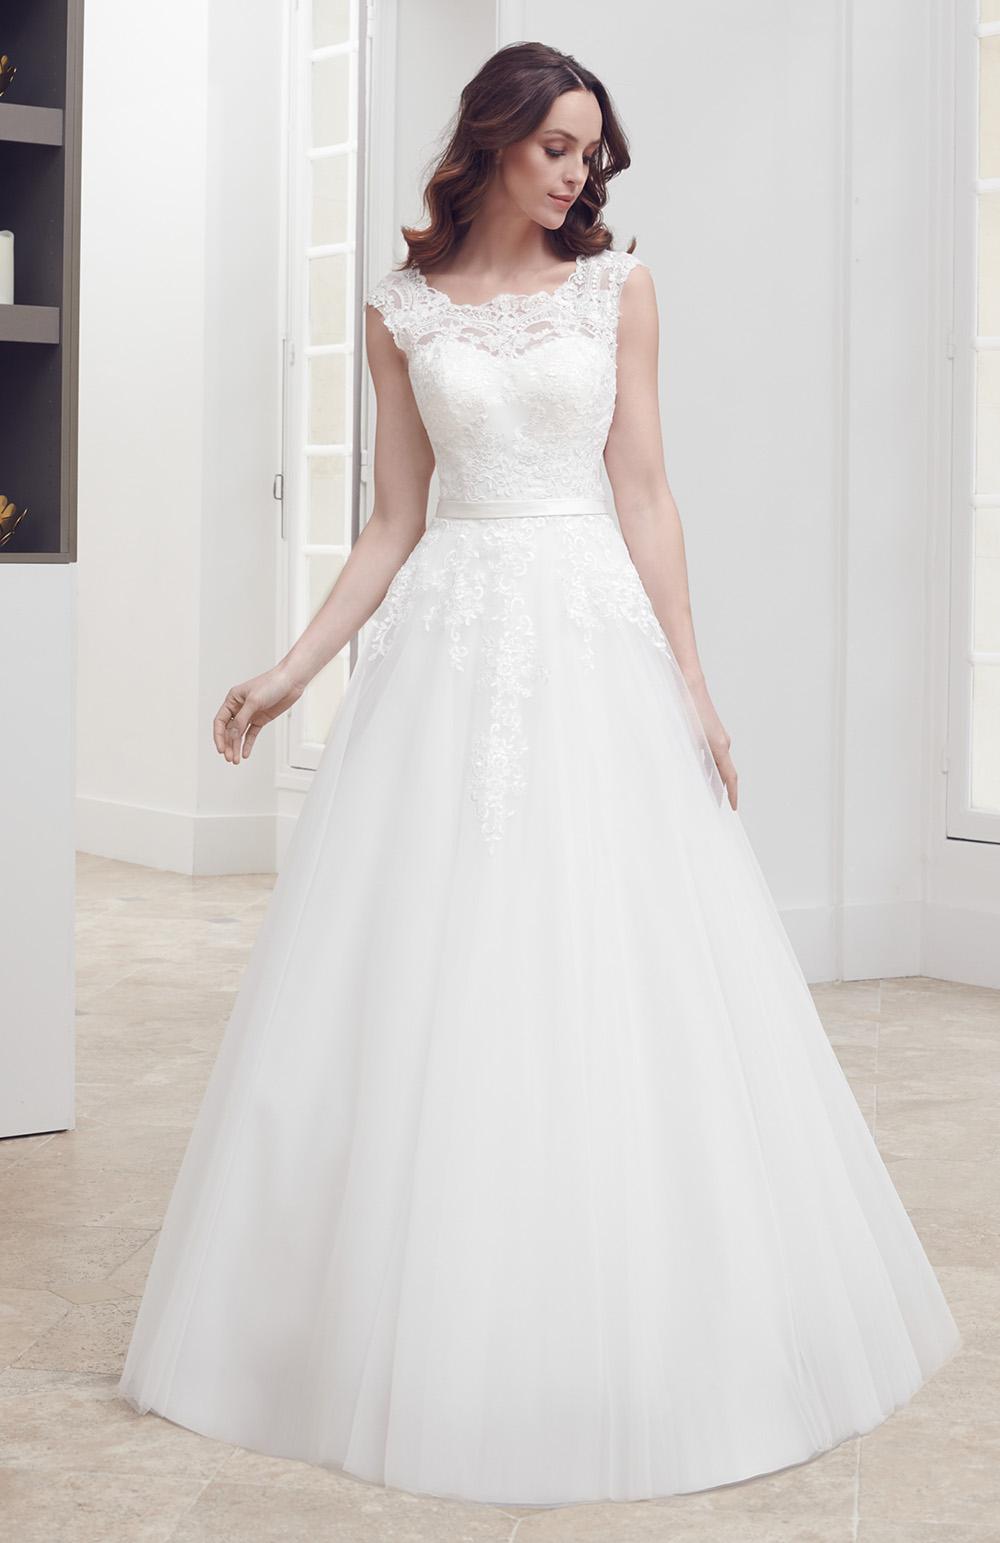 Robe de mariée Modèle Robyn